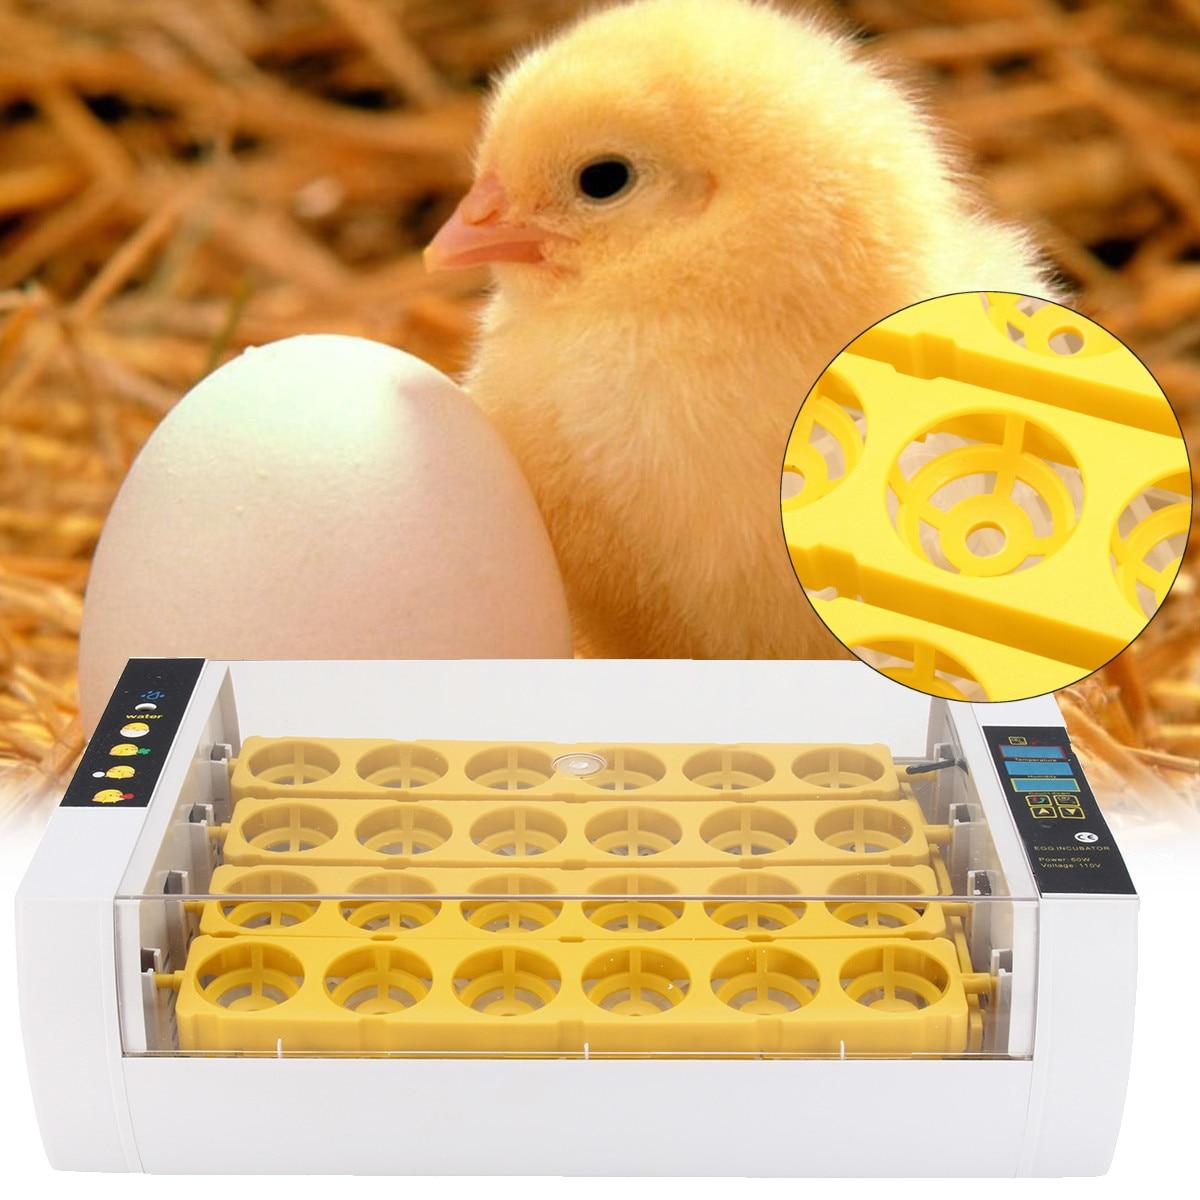 Automatic Hatcher Machine 24 Hole Incubator Chicken Duck Digital Display Smart Sensitive Poultry Hatcher Tray Brooder 110V /220V